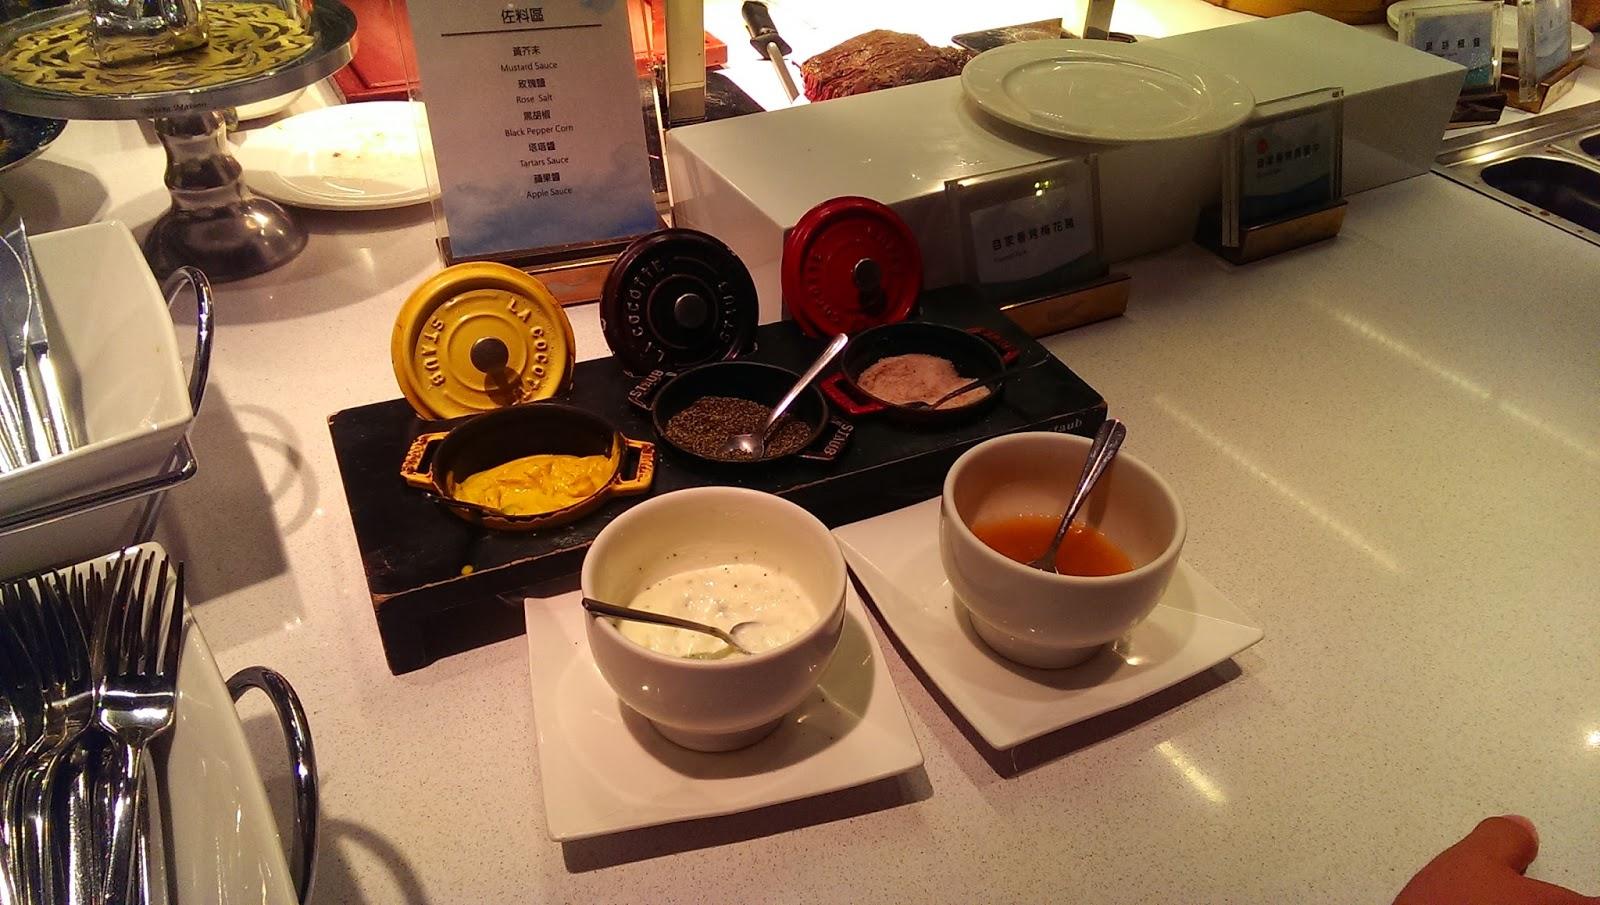 2015 07 01%2B20.08.25 - [食記] 台北京站 - 饗食天堂,有生魚片吃到飽的高級自助餐廳!